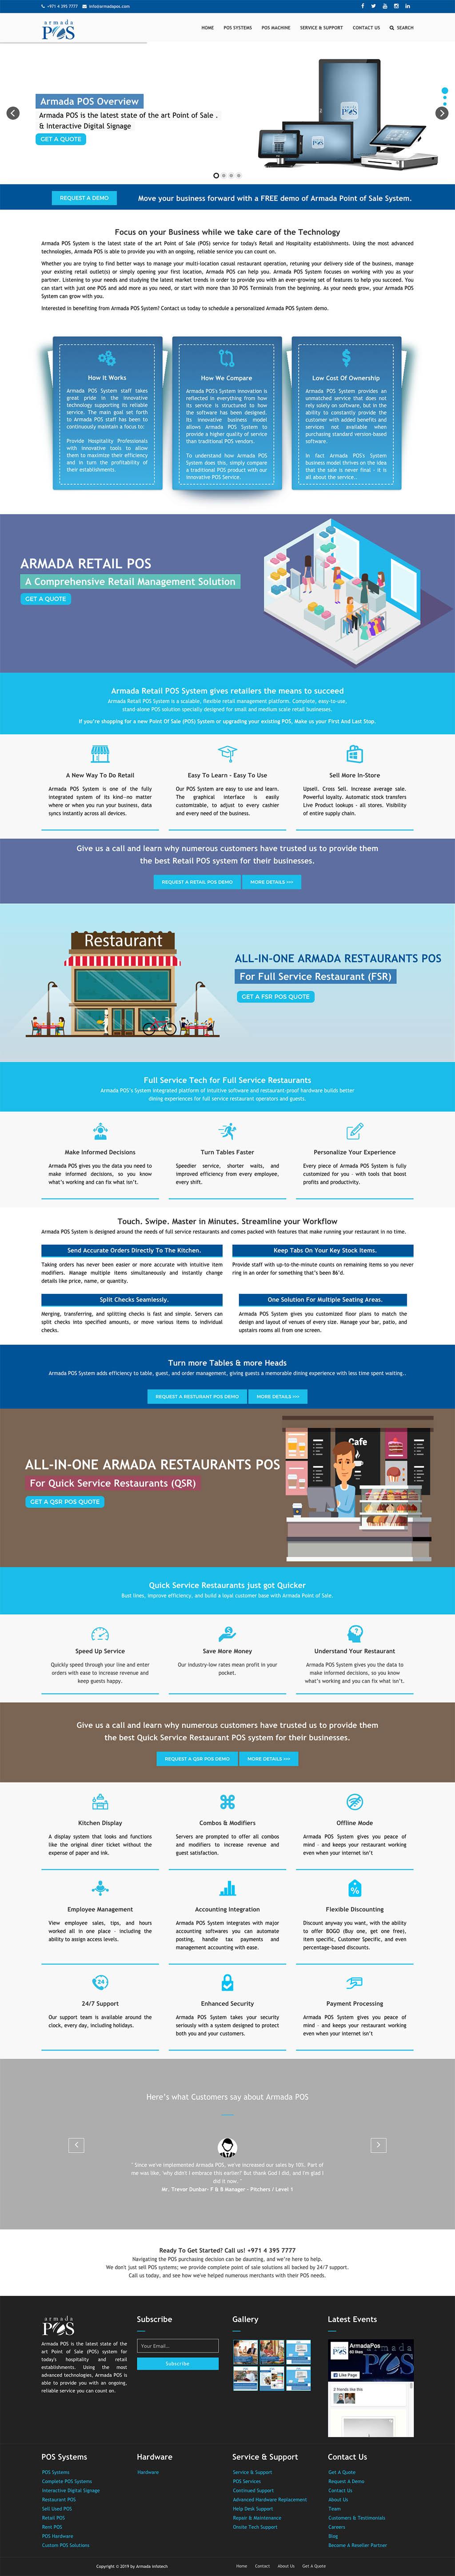 armada pos home page